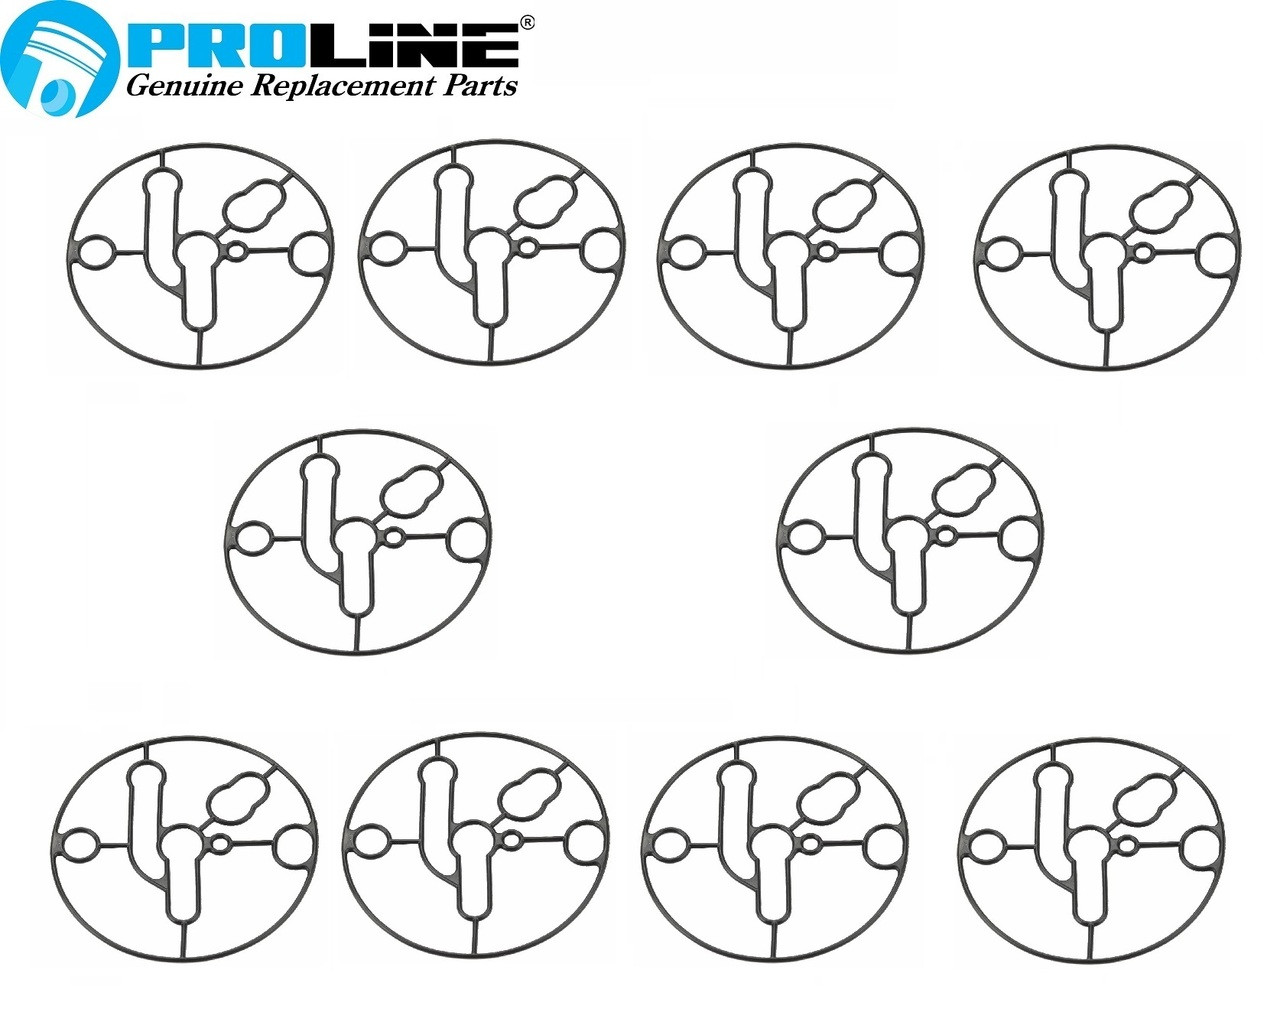 Proline® Carburetor Bowl Gasket 10 pack For Briggs And Stratton 698781 Nikki